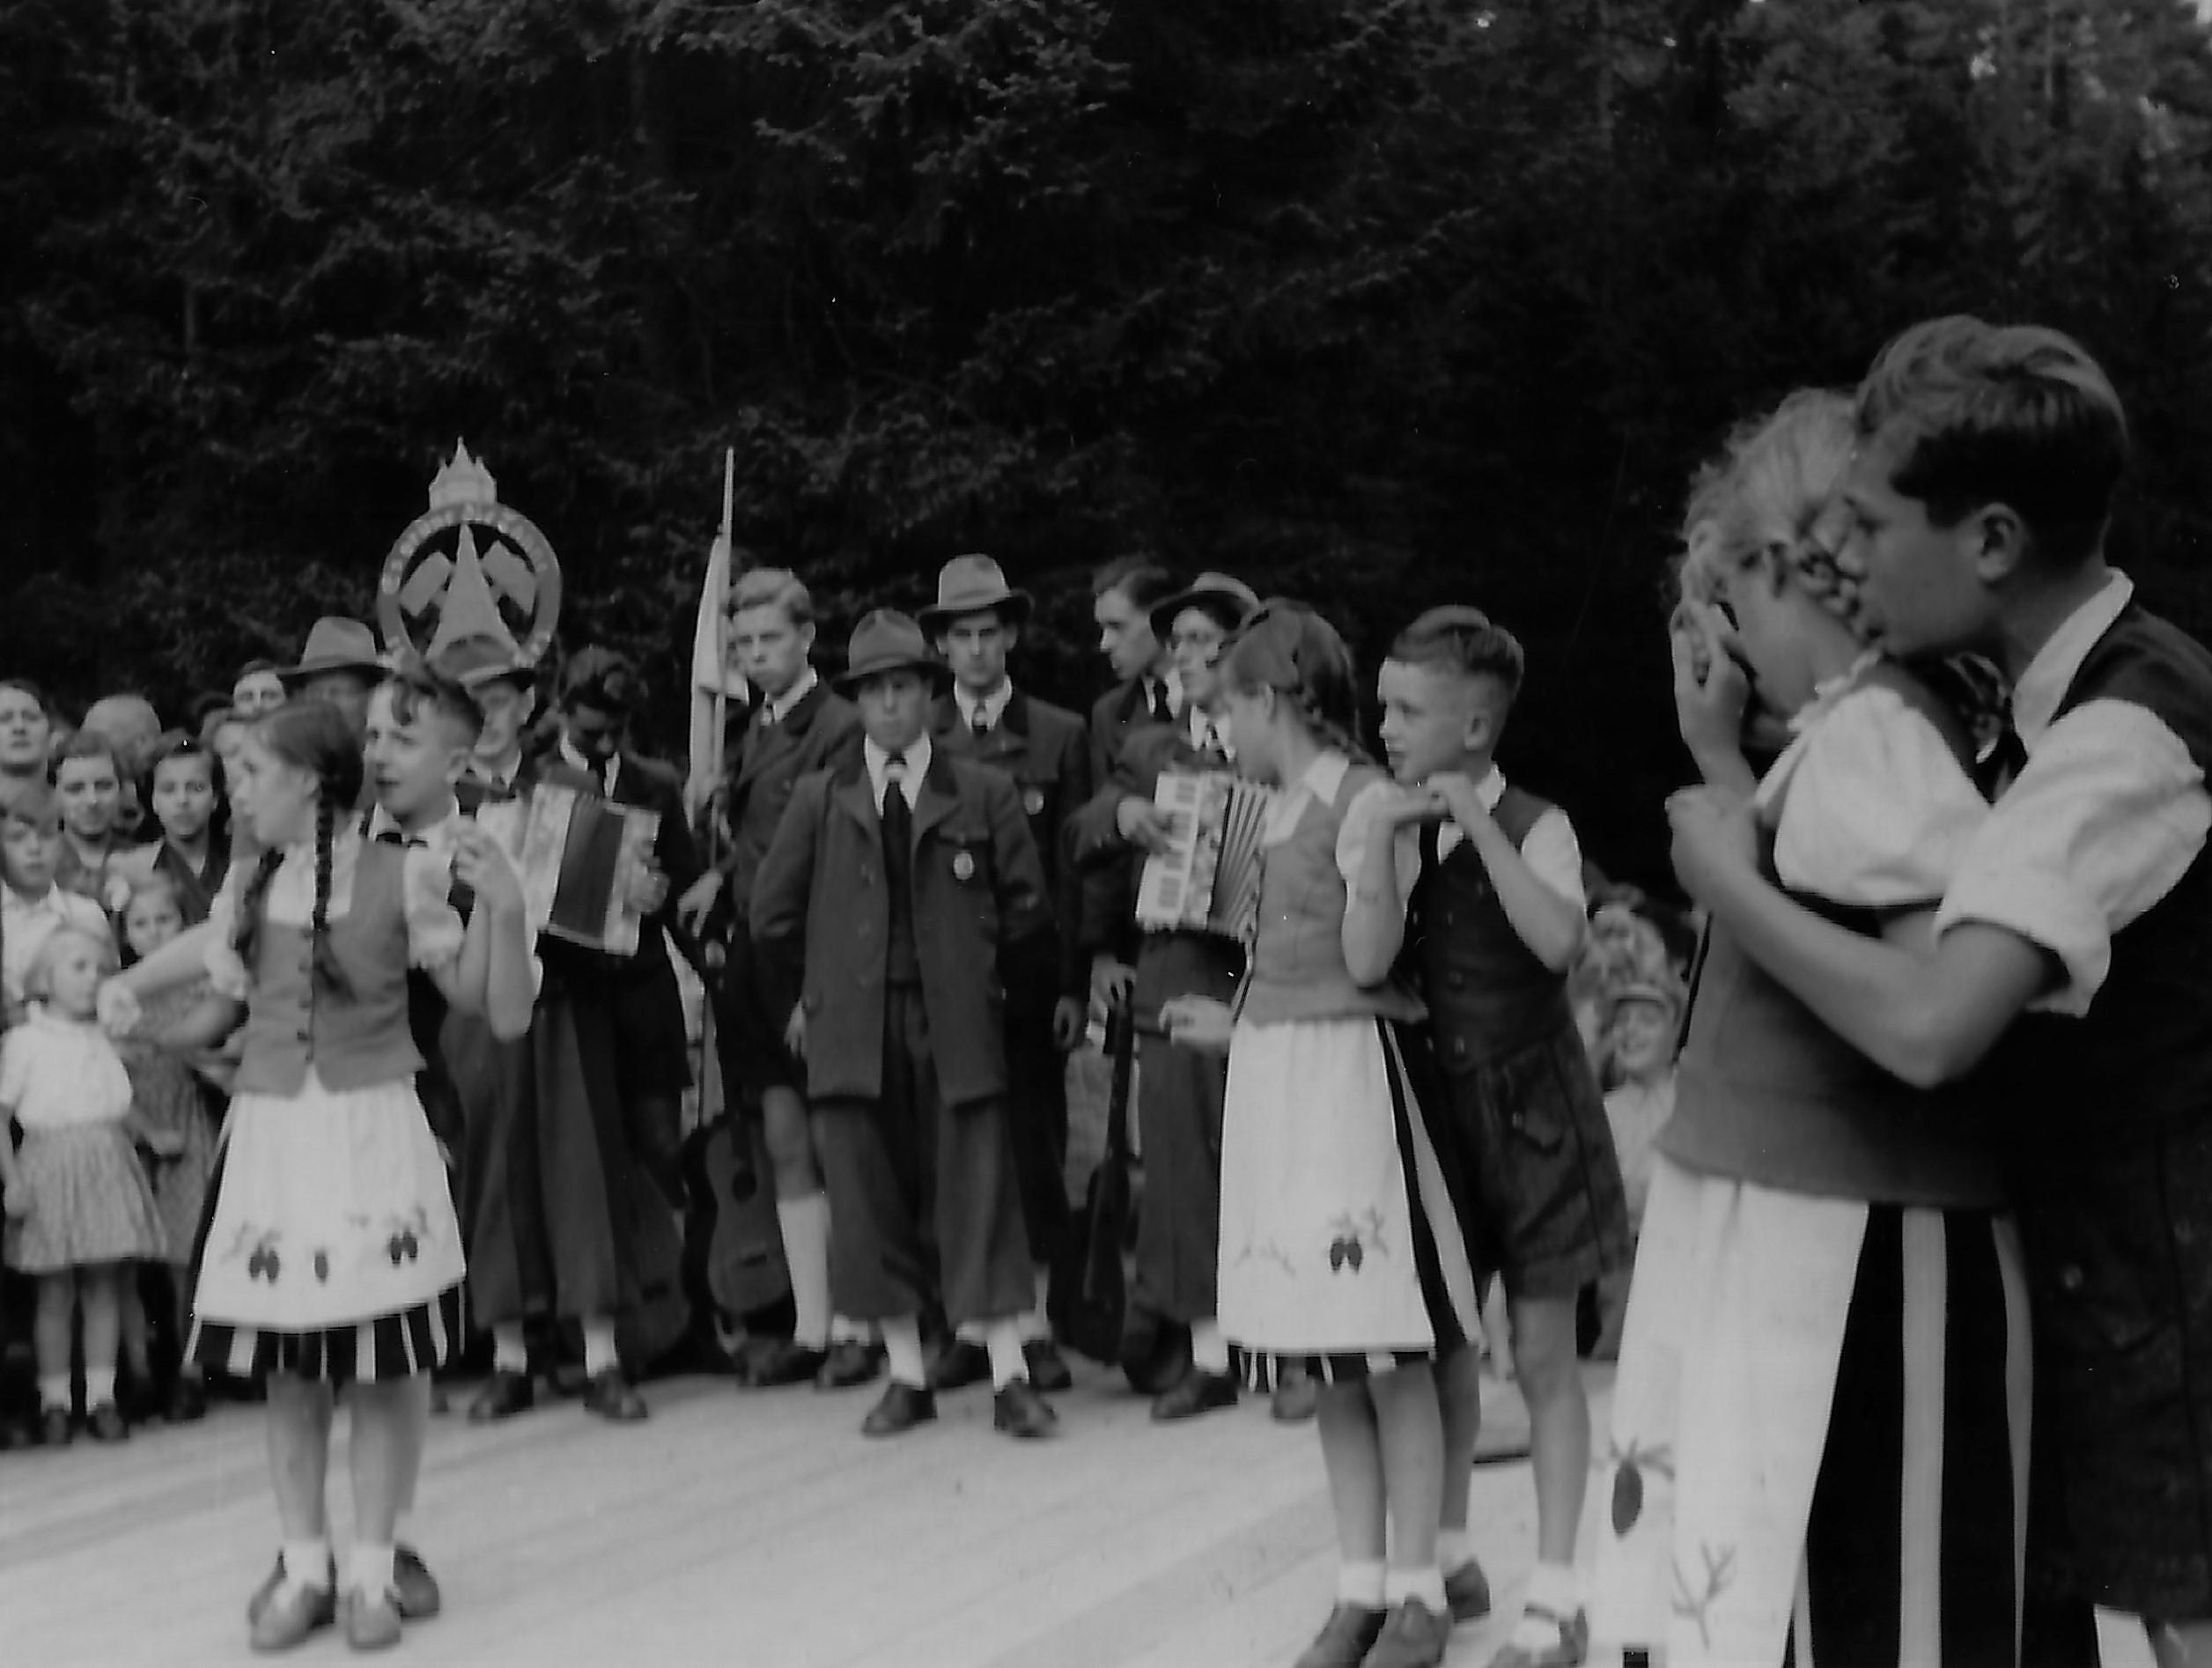 Jugendgruppe 1954 Harzklub